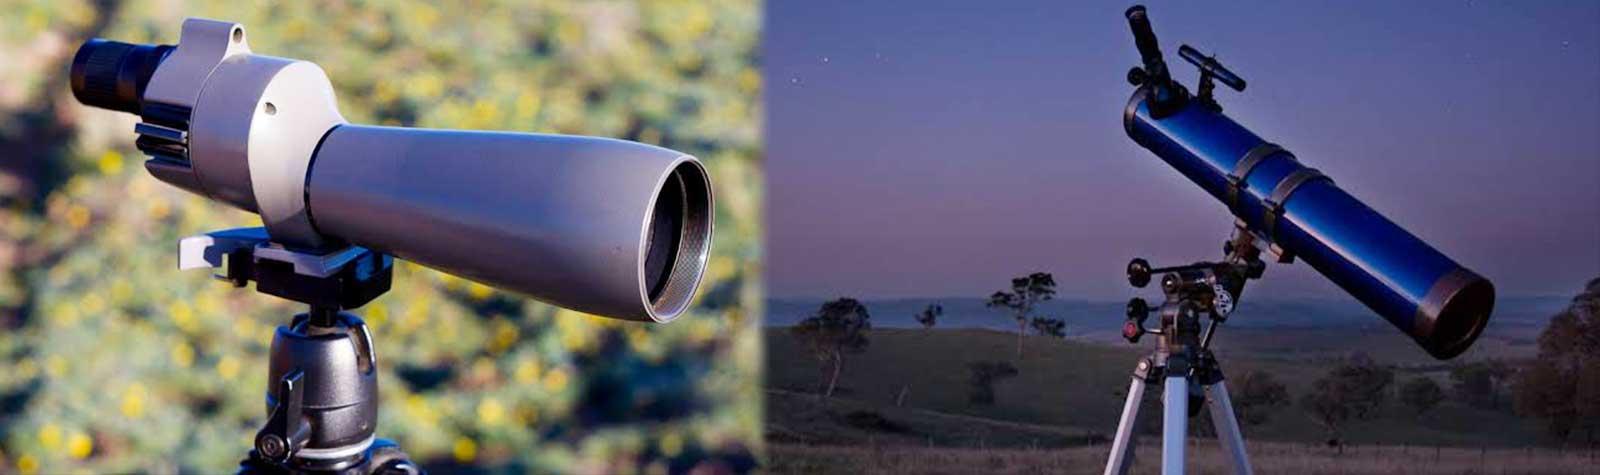 Spotting Scopes vs. Telescopes- In details comparison